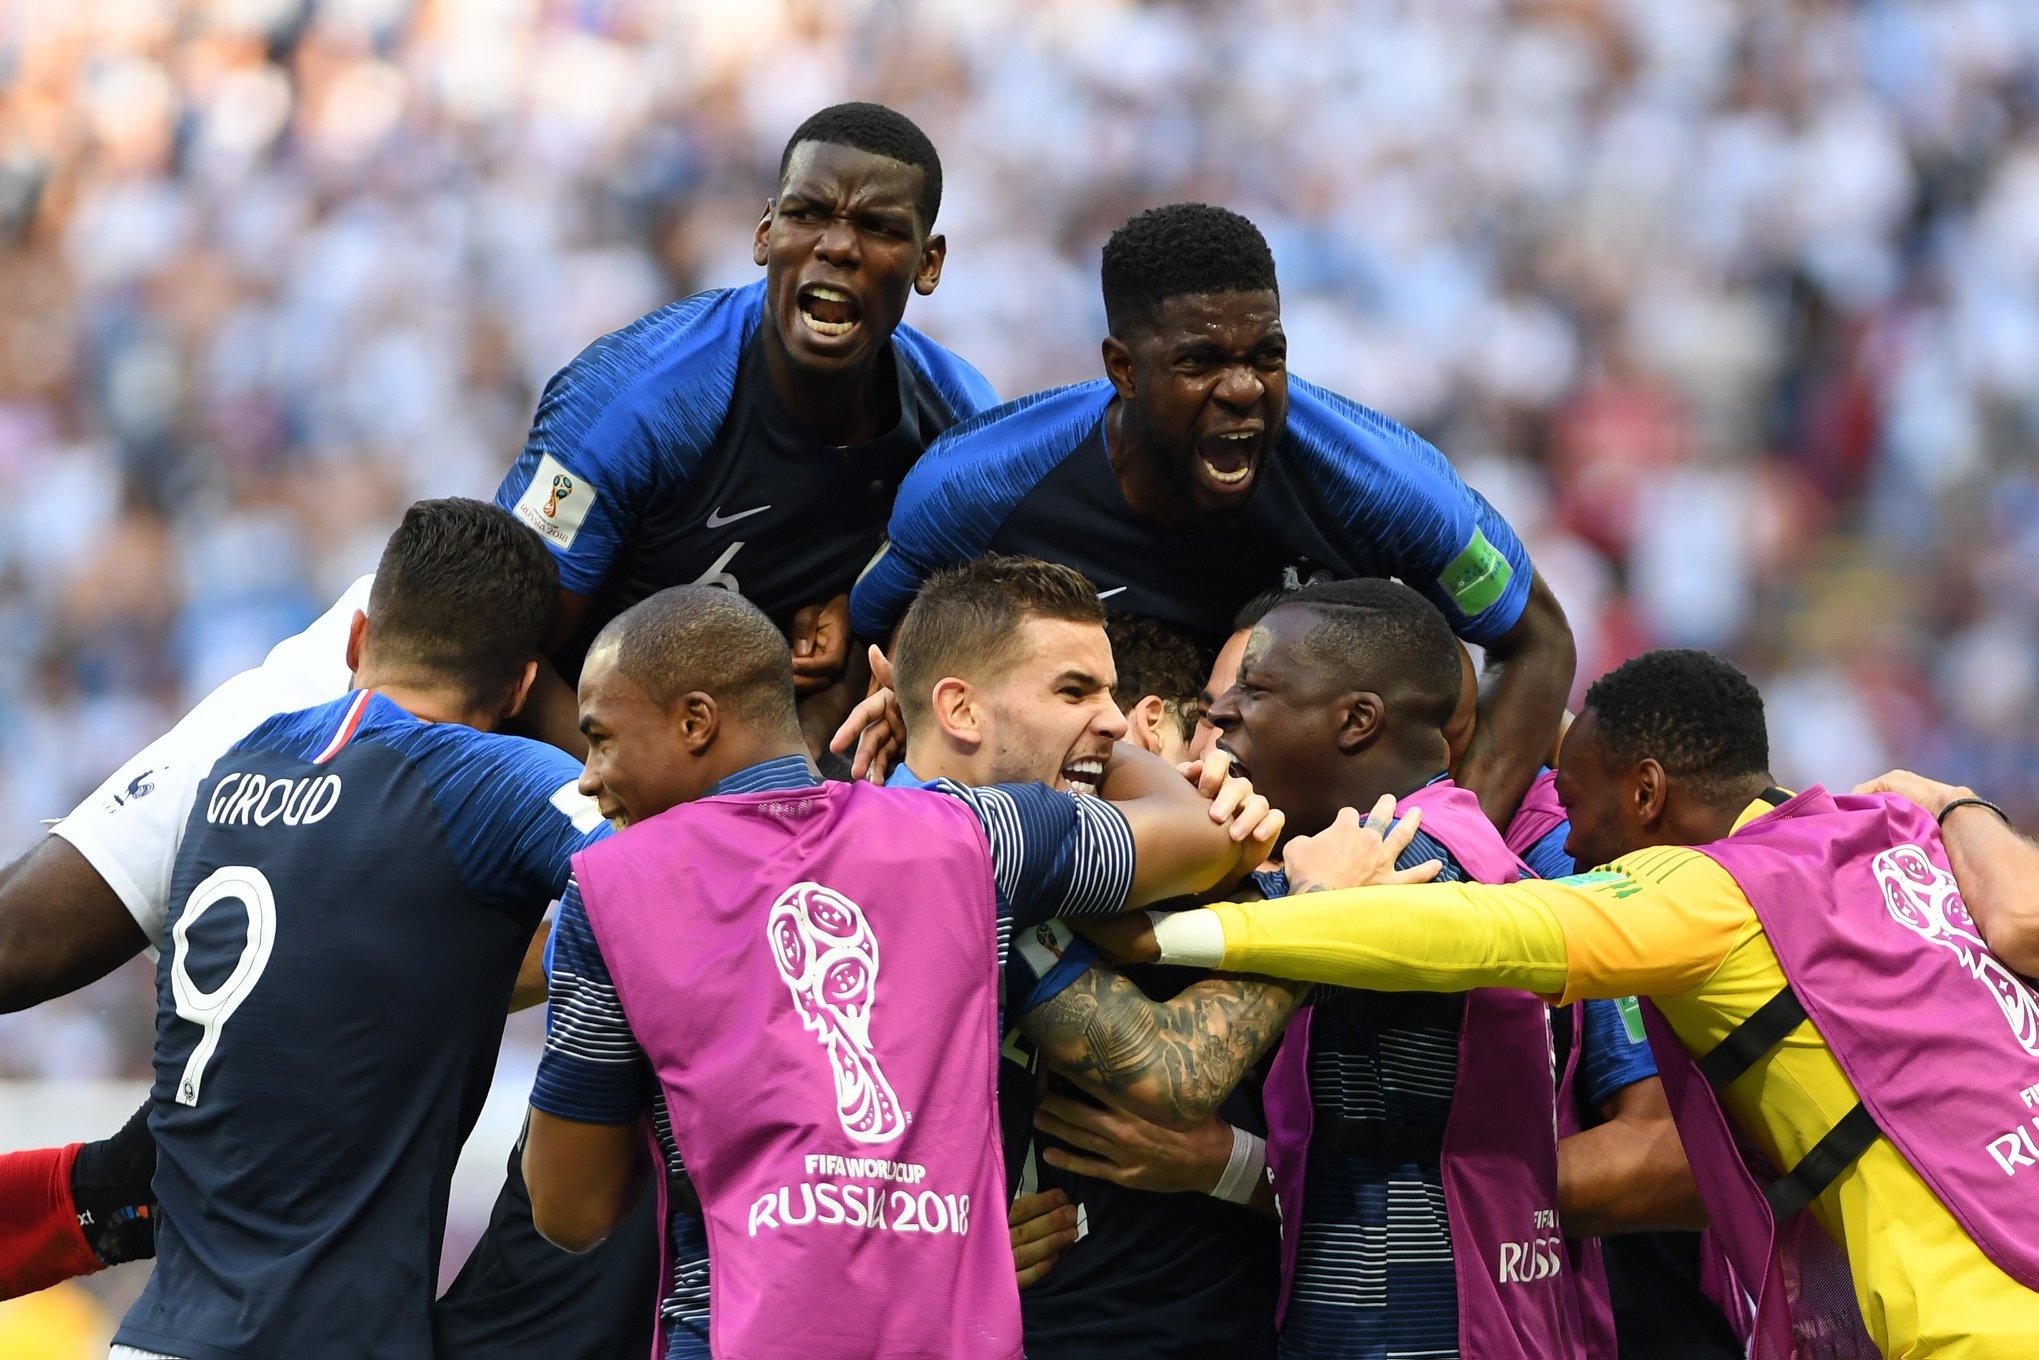 Francia elimina a Argentina y es candidata a ganar el Mundial